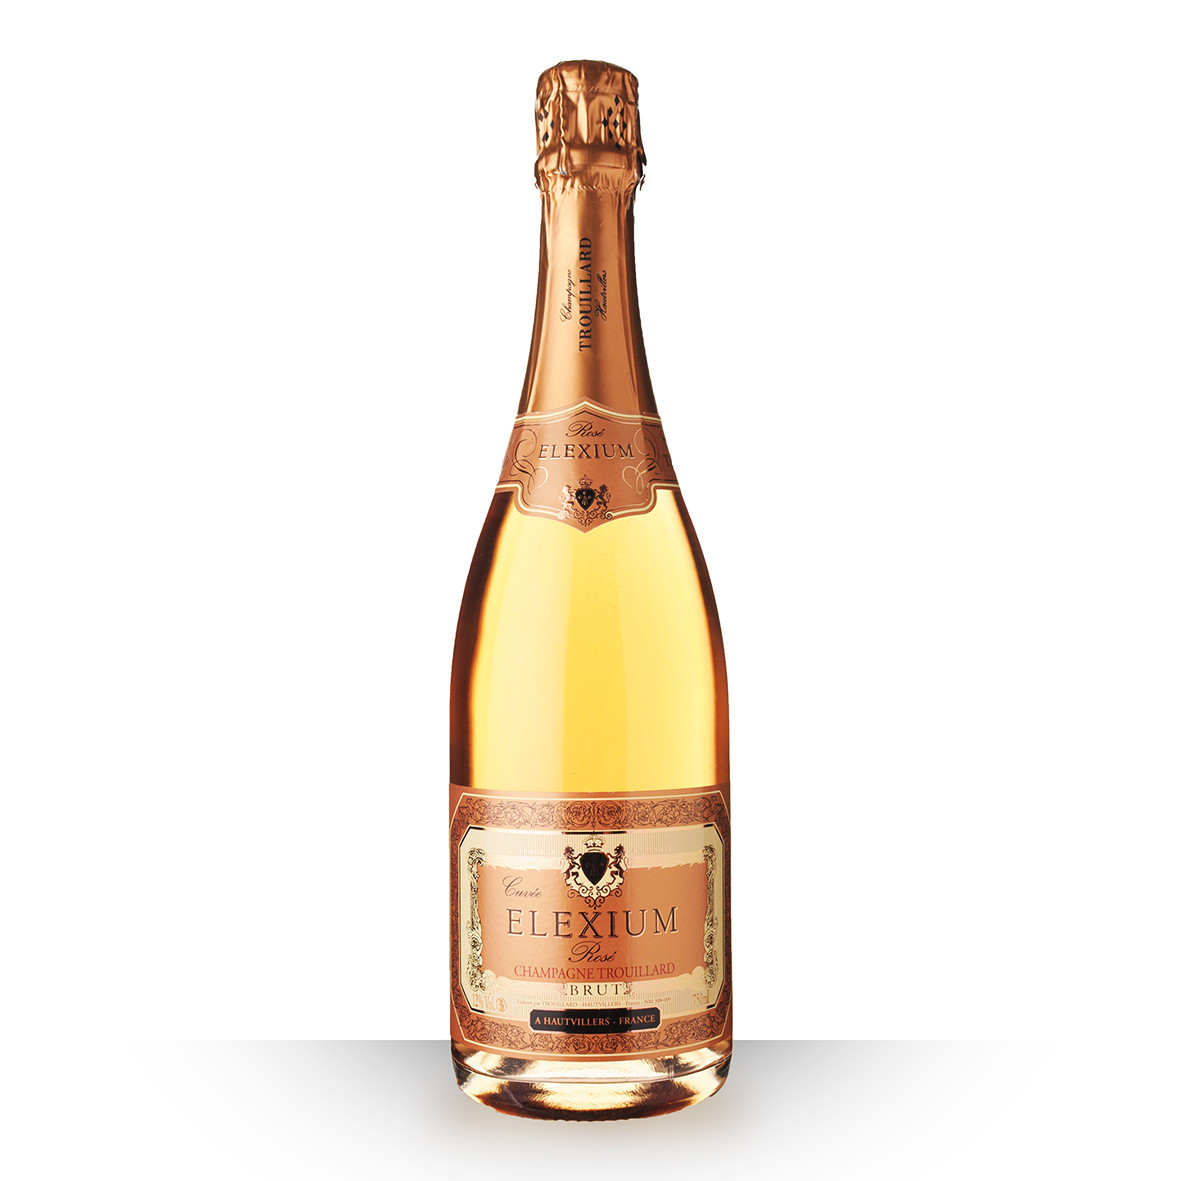 Champagne Trouillard Elexium Brut Rosé 75cl www.odyssee-vins.com